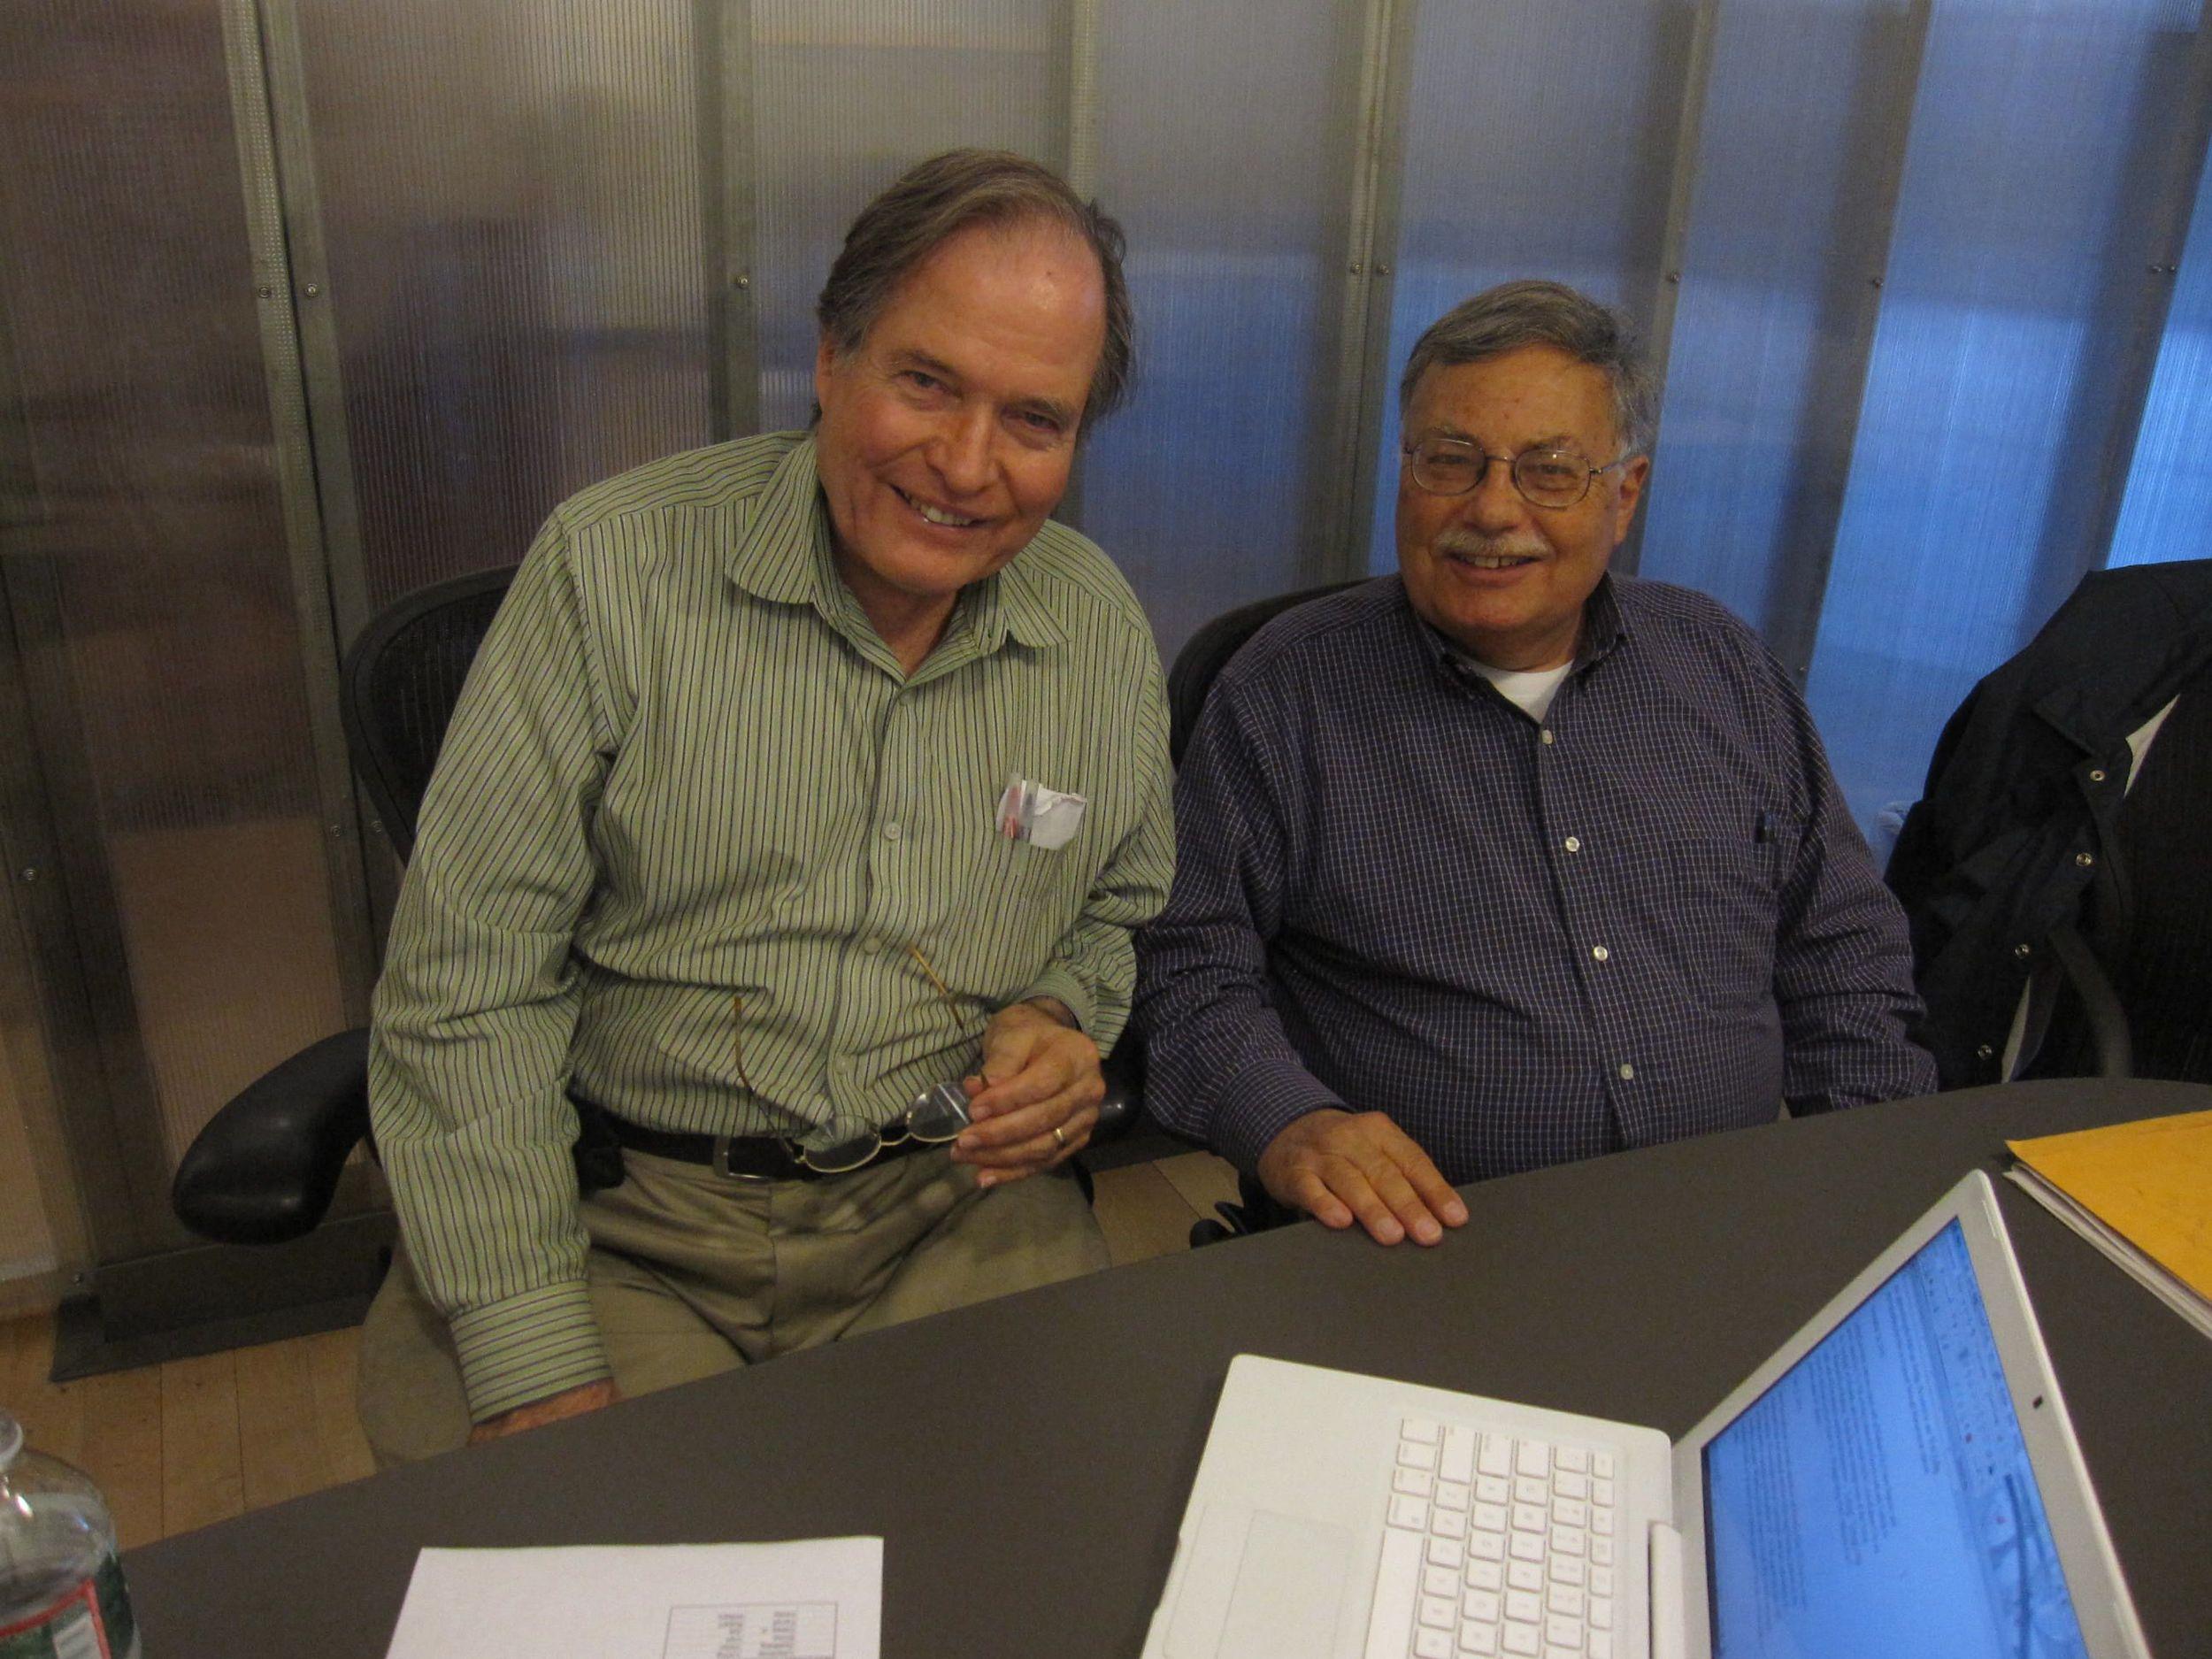 Al Holtz and Walter E. Zullig, Jr., July 2012.